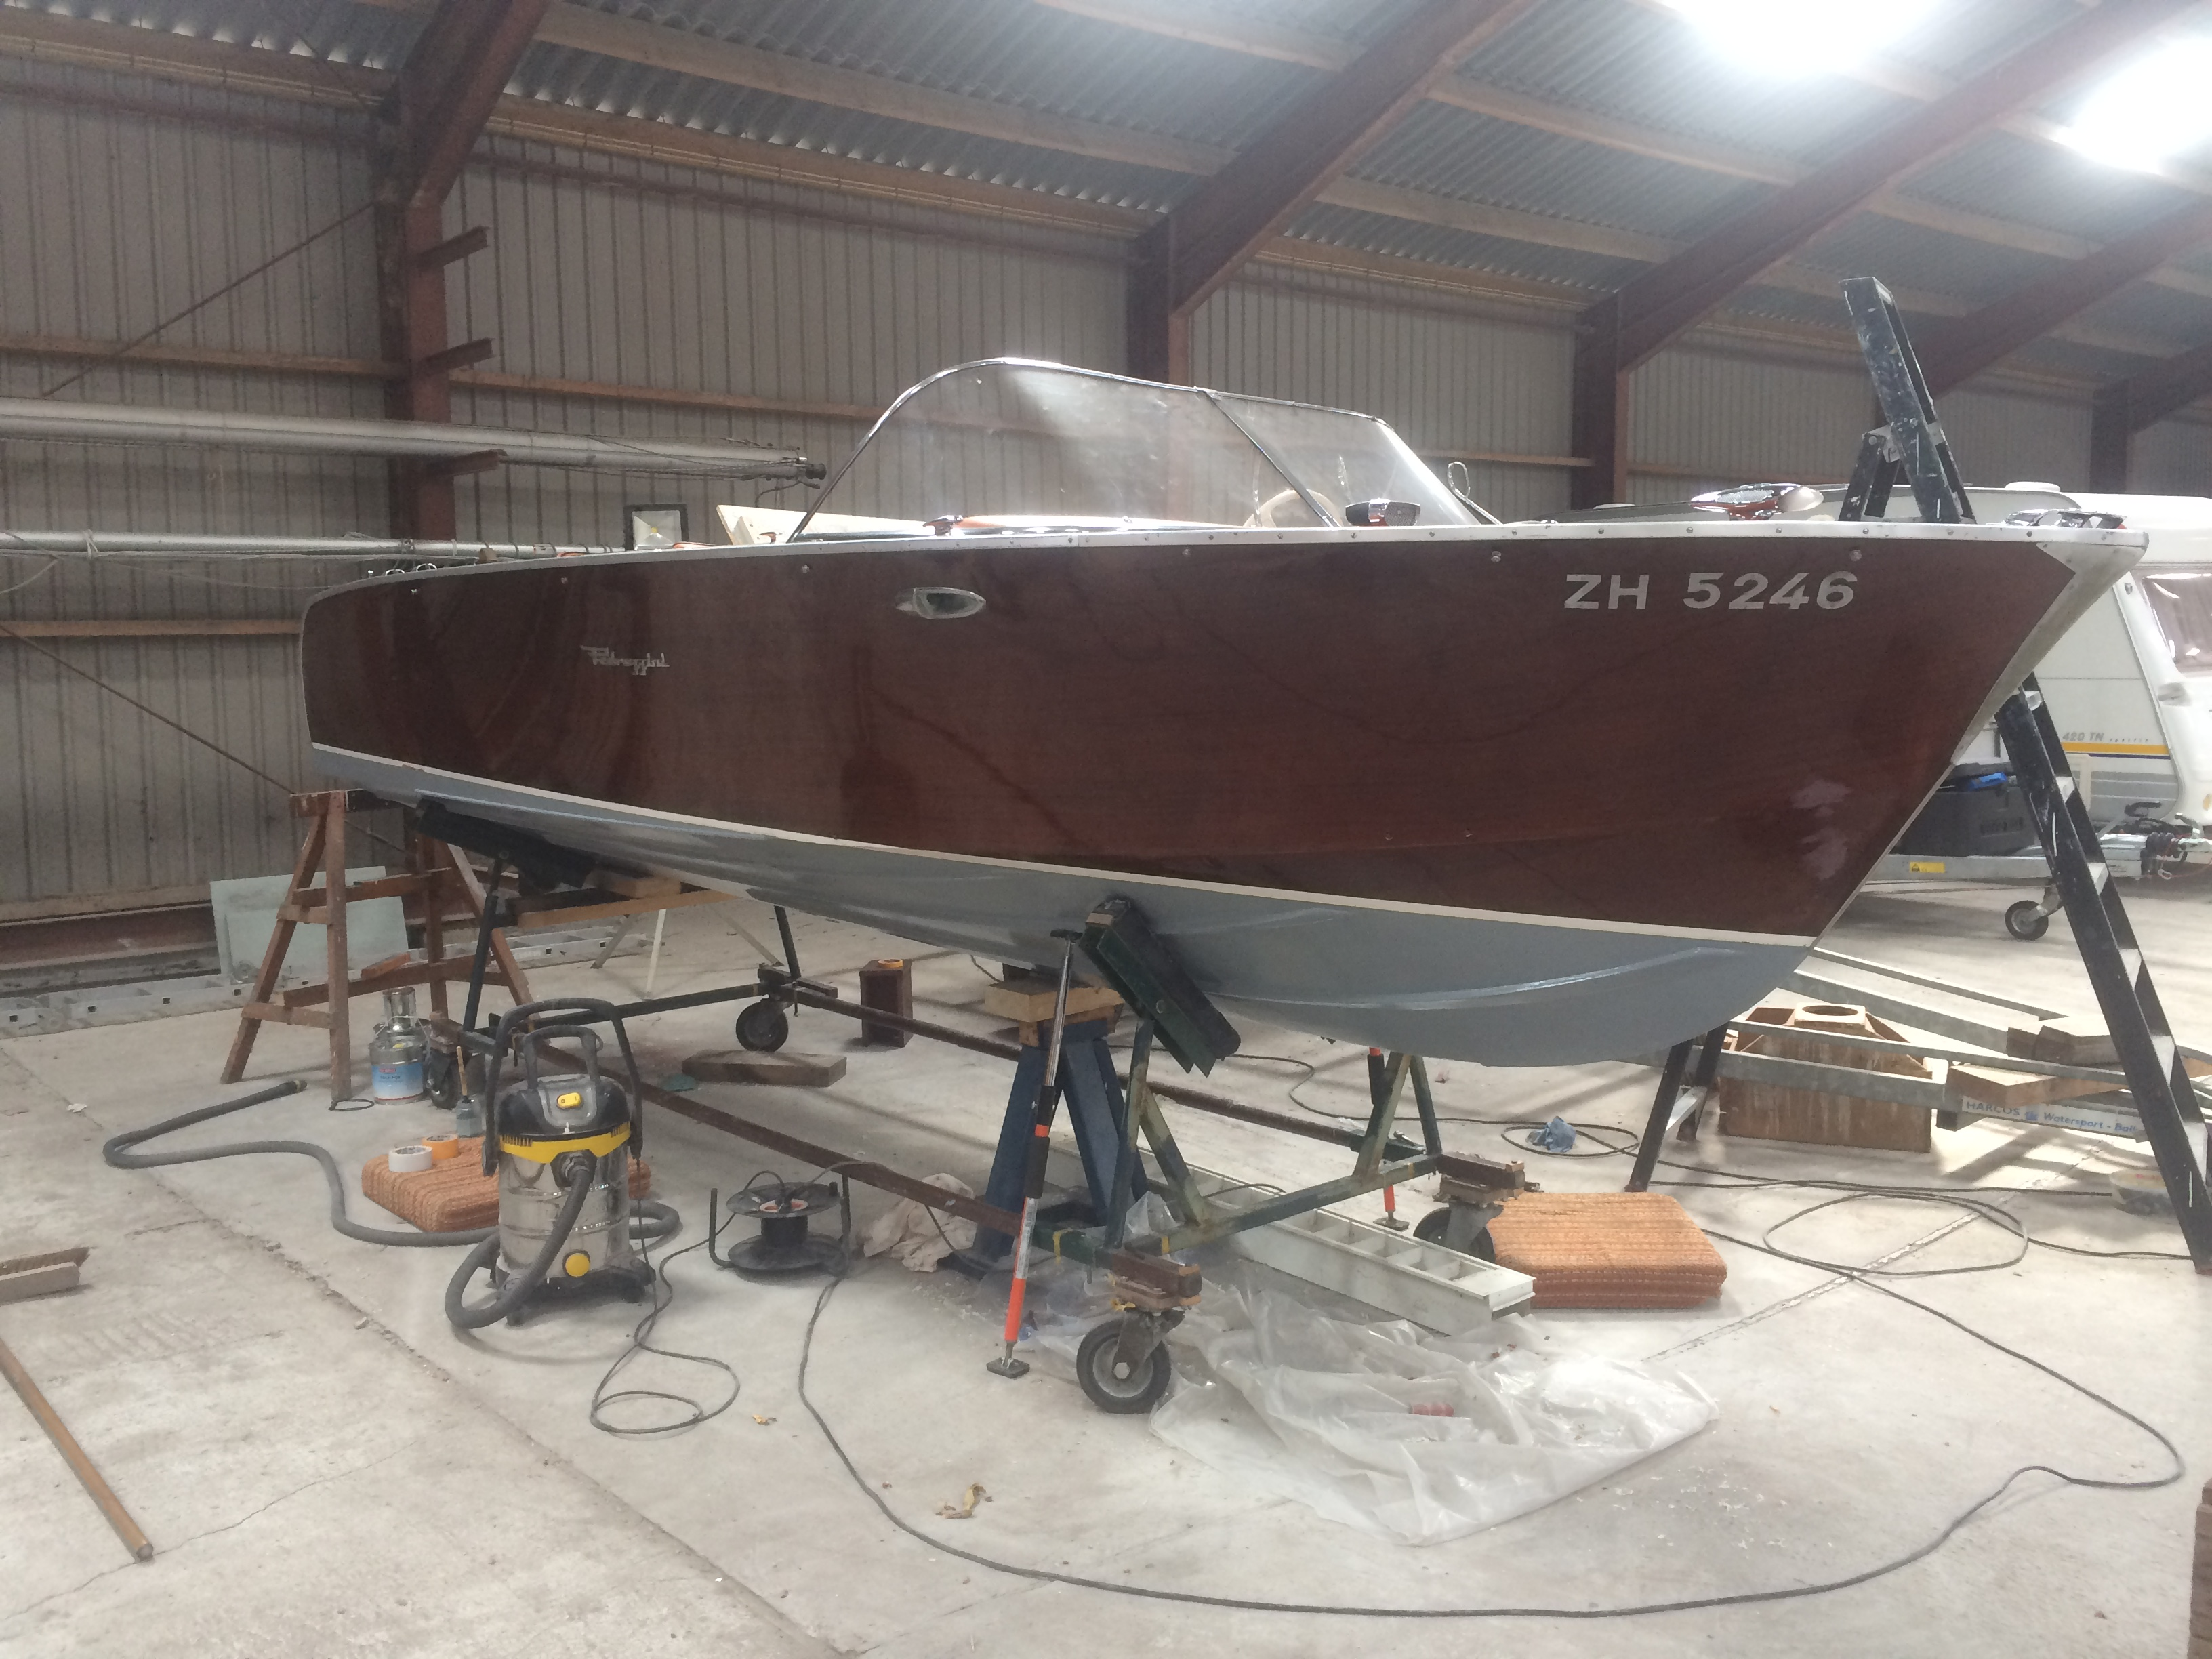 Reparatie Pedrazinni speedboat